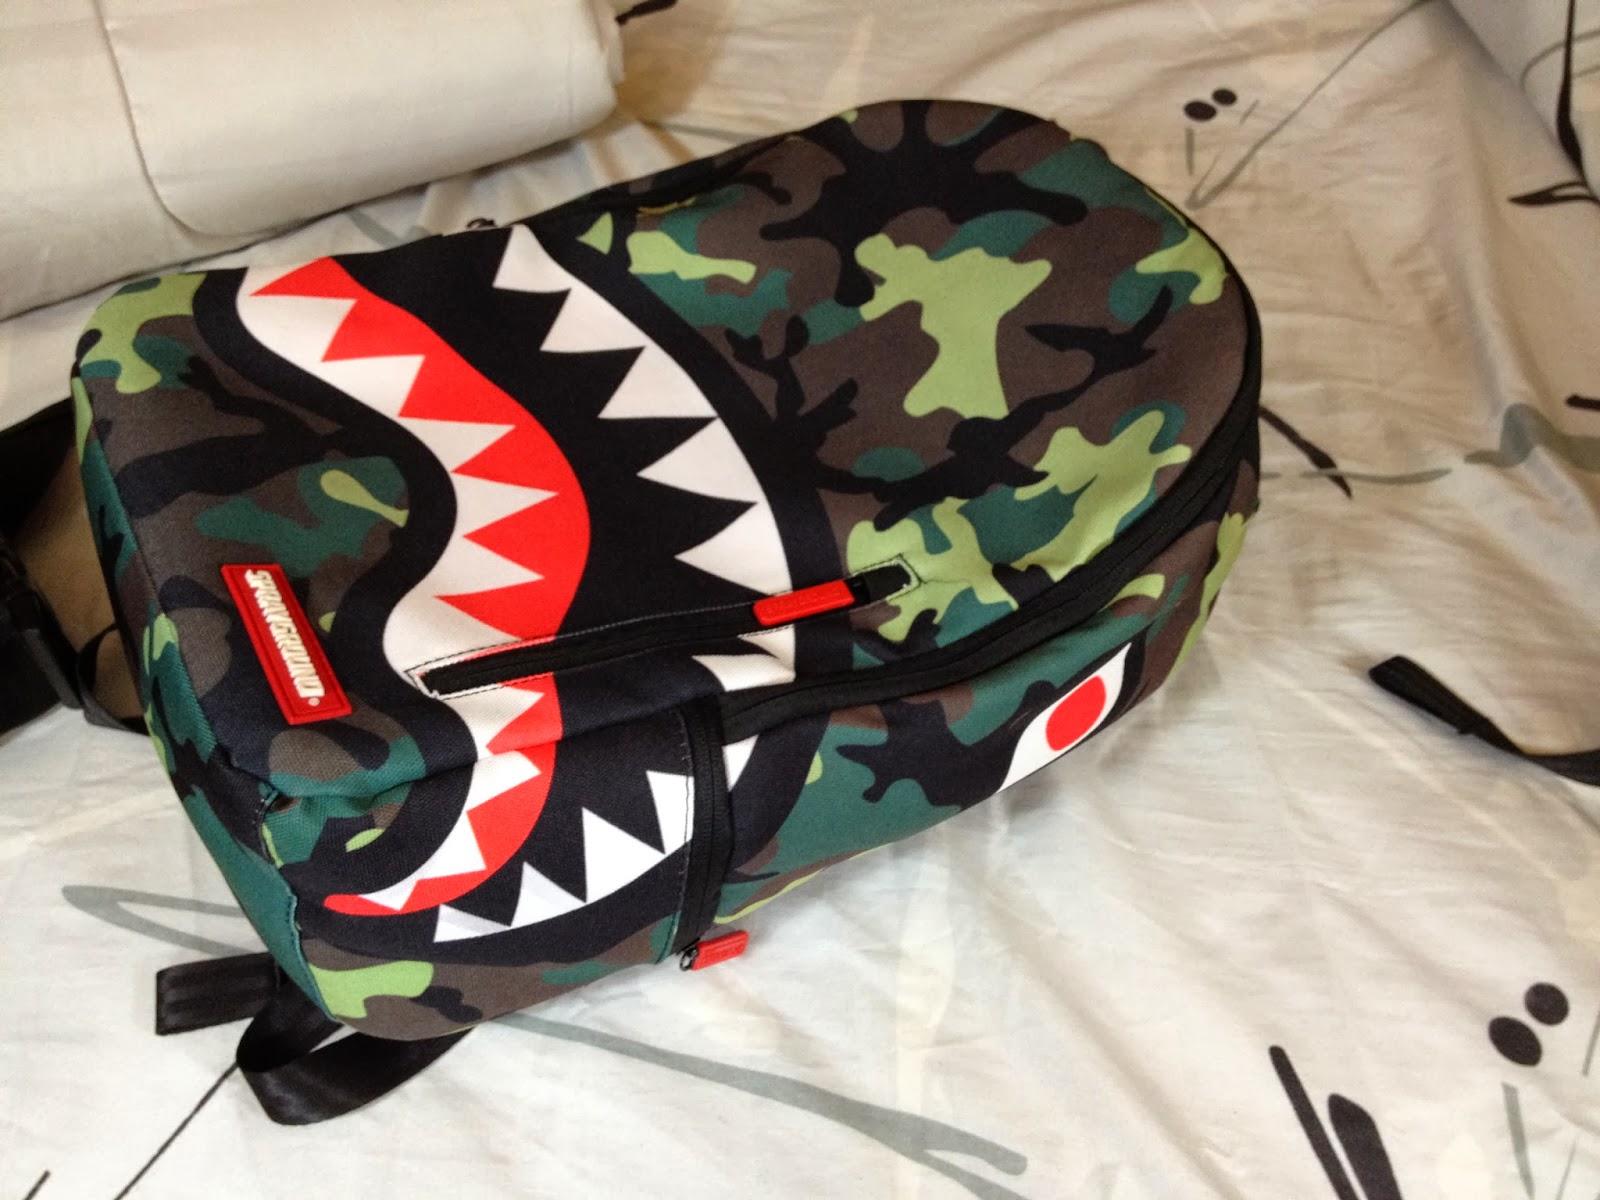 Camo Desktop Wallpaper furthermore Sprayground X Beyond Hype Black Camo Shark Bag Collection Now Available also Money Kicks Supreme Lv Ferrari Video additionally 518617713311061093 also Xxtentacion. on supreme bape back ground